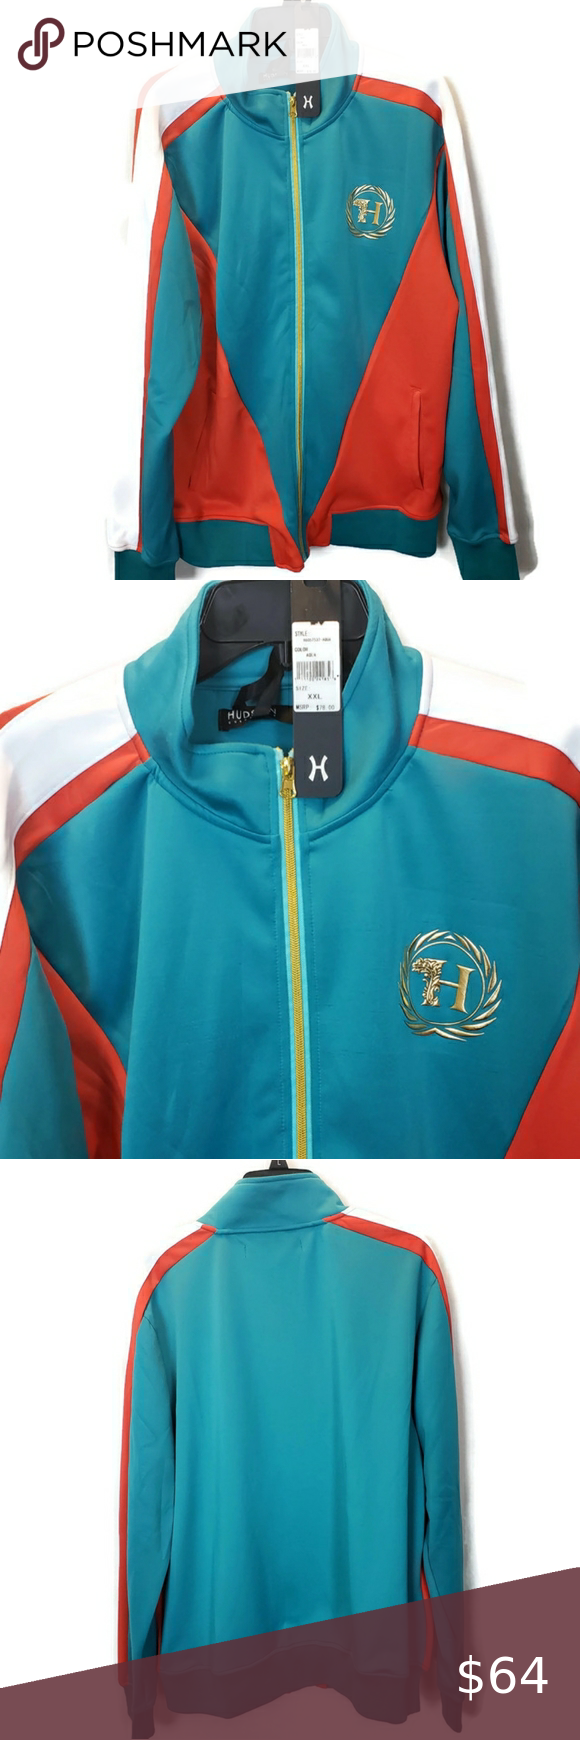 Hudson Outerwear Size Men S 2x Full Zipjacket Clothes Design Fashion Hooded Jacket Sweatshirts [ 1740 x 580 Pixel ]